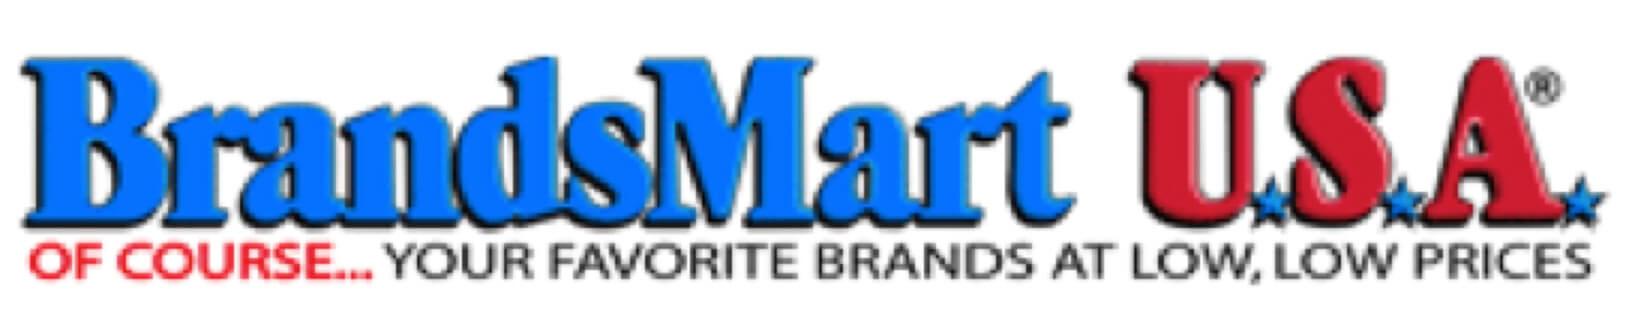 logo-brandsmart-usa